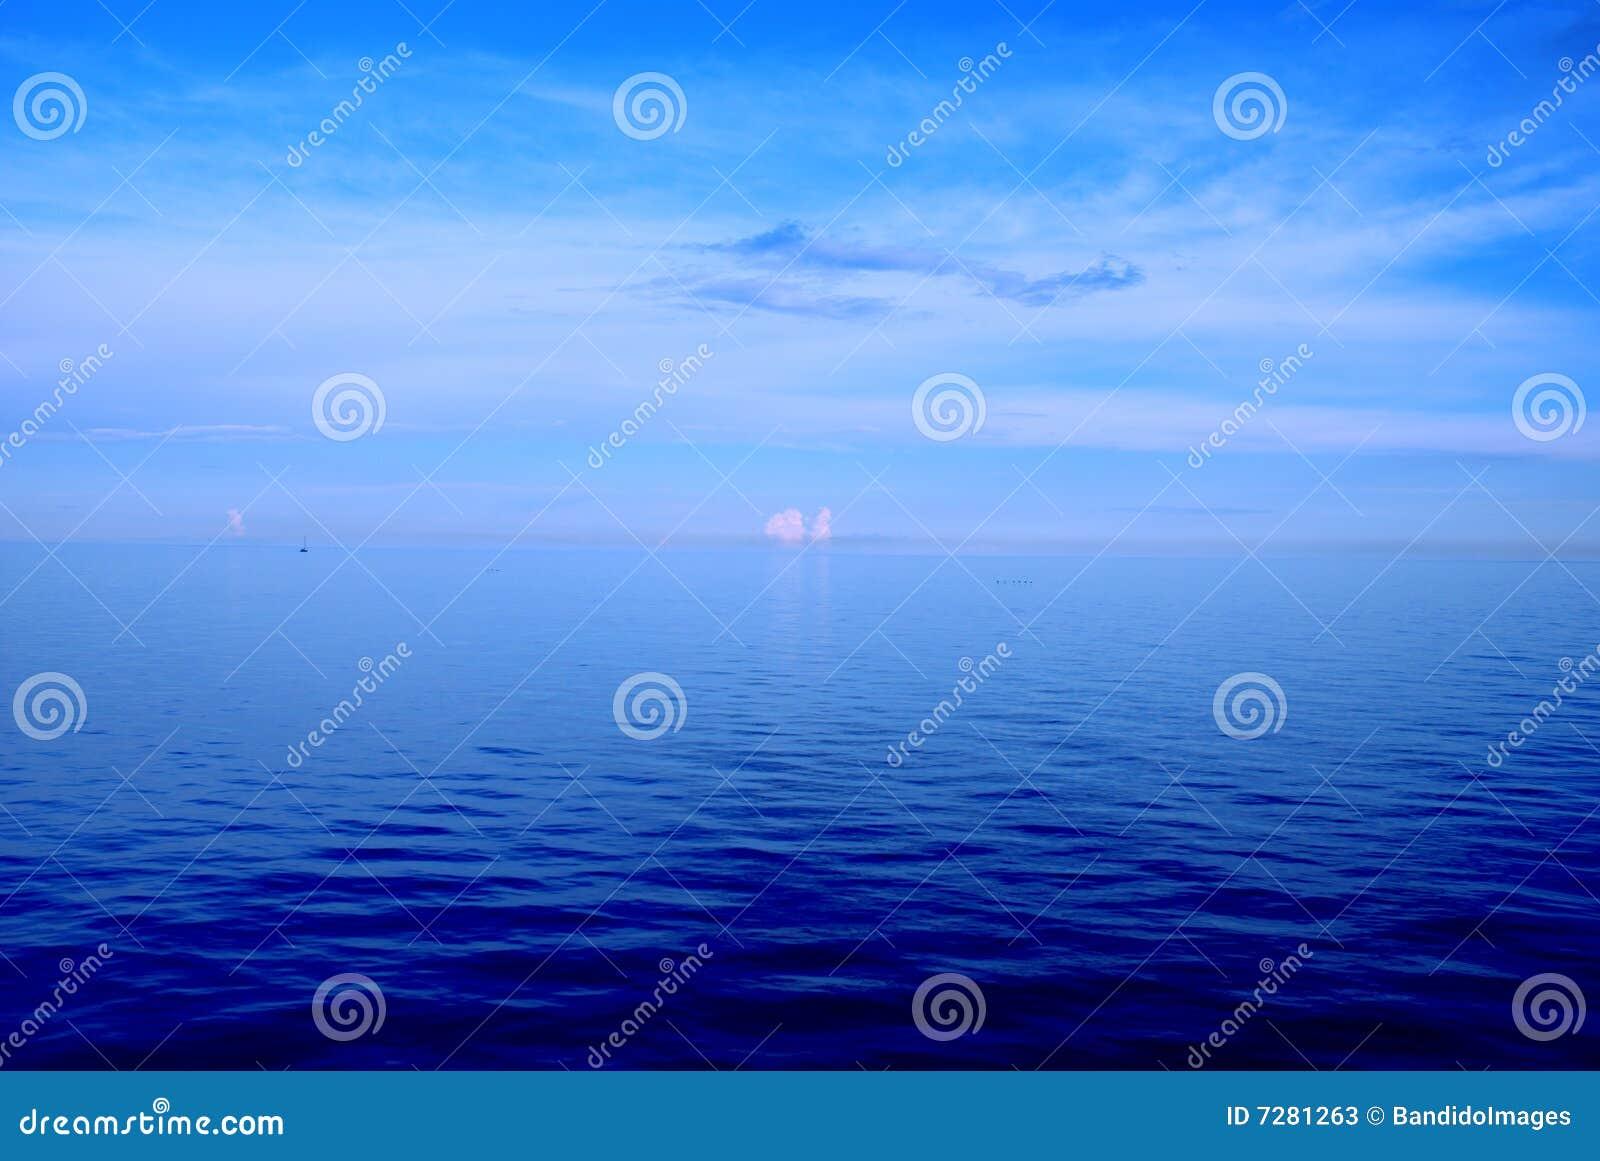 Mar azul profundo